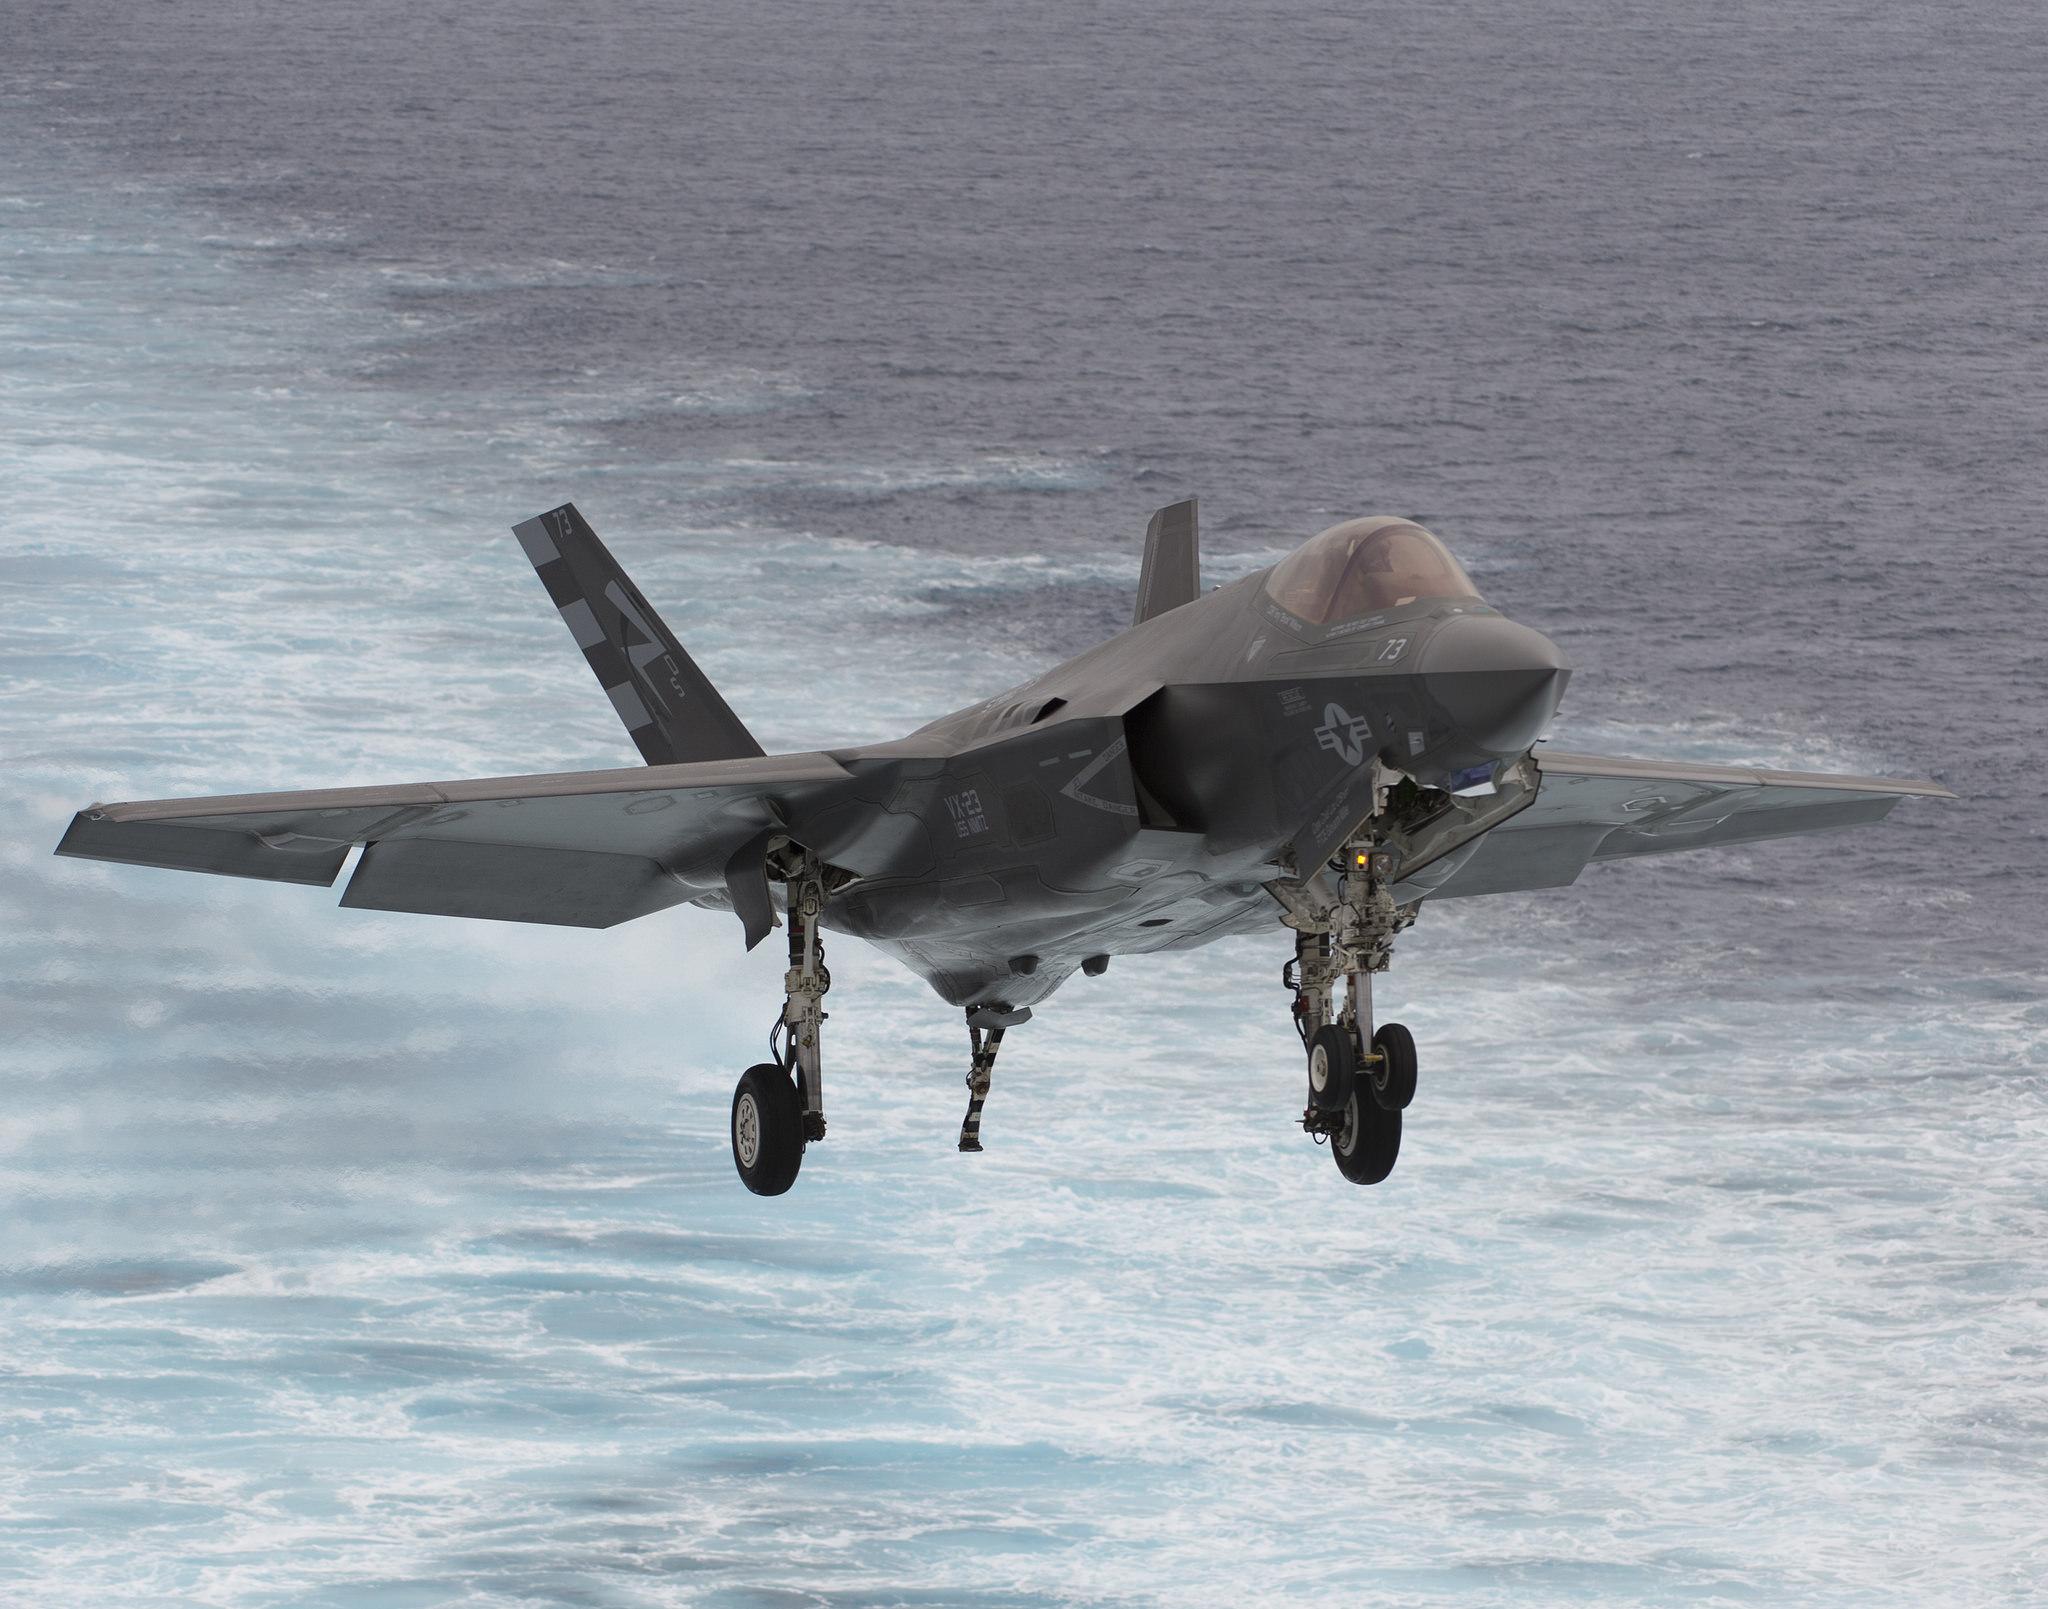 America's new trillion-dollar fighter jet under fire again